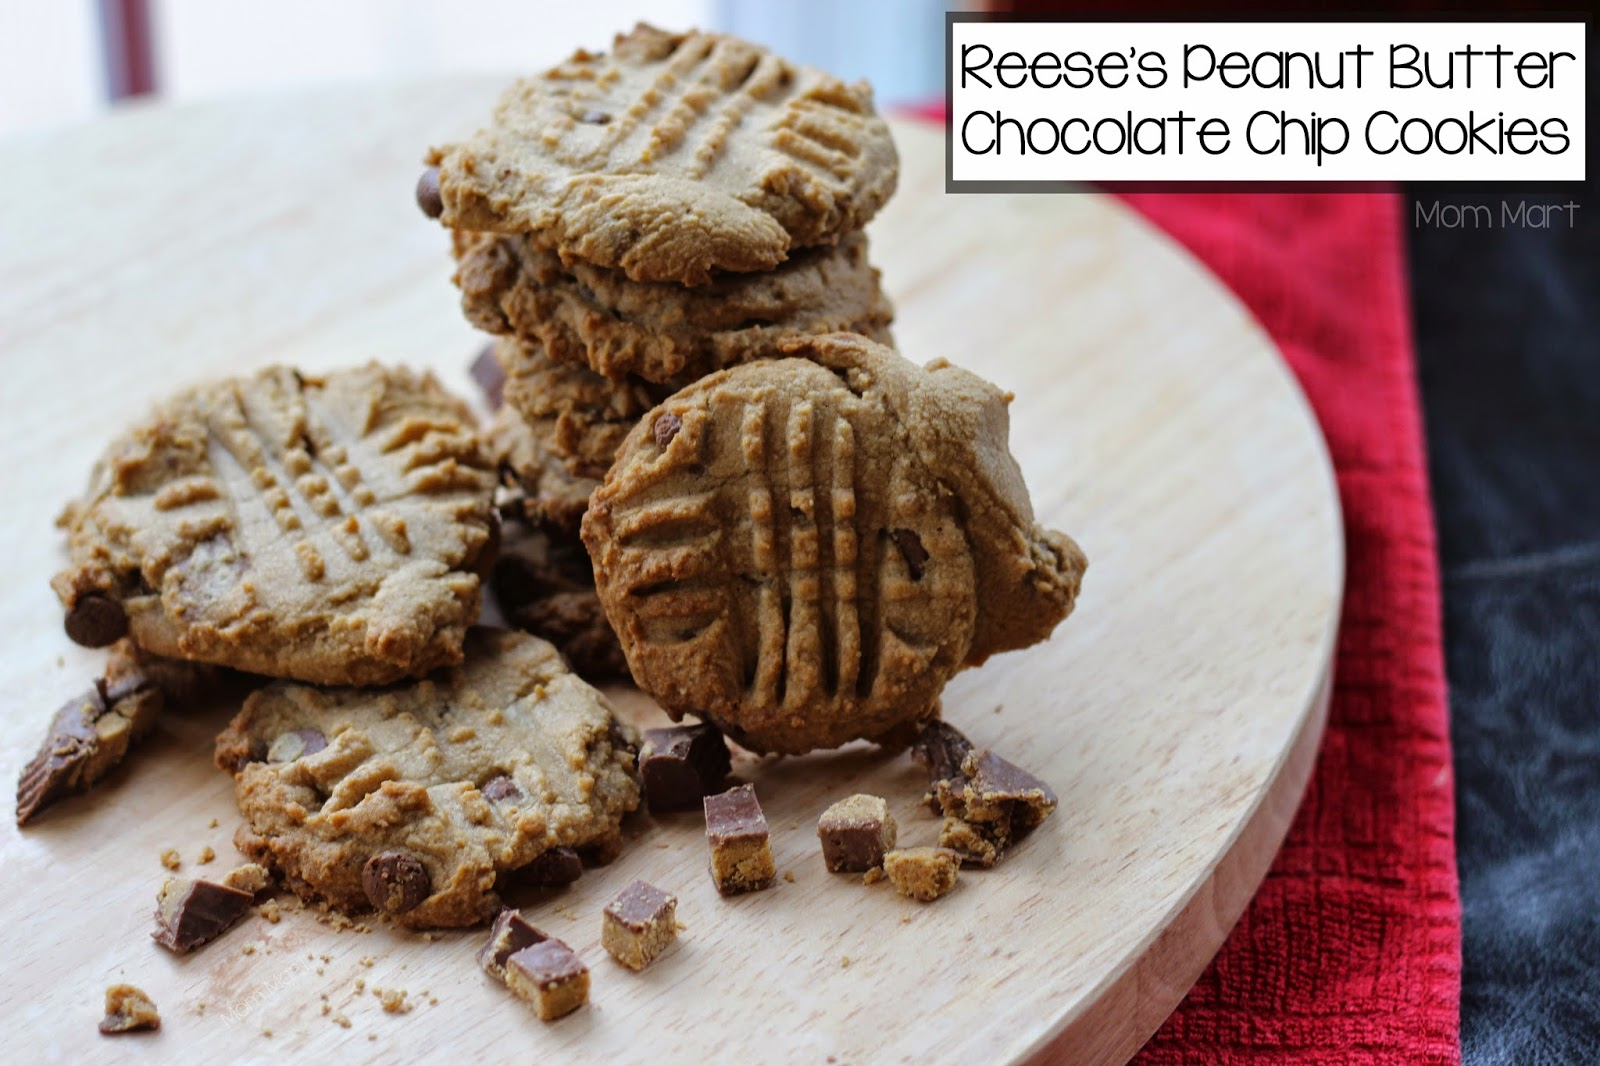 Reese's Peanut Butter Chocolate Chip Cookies #Recipe #Dessert #Foodie